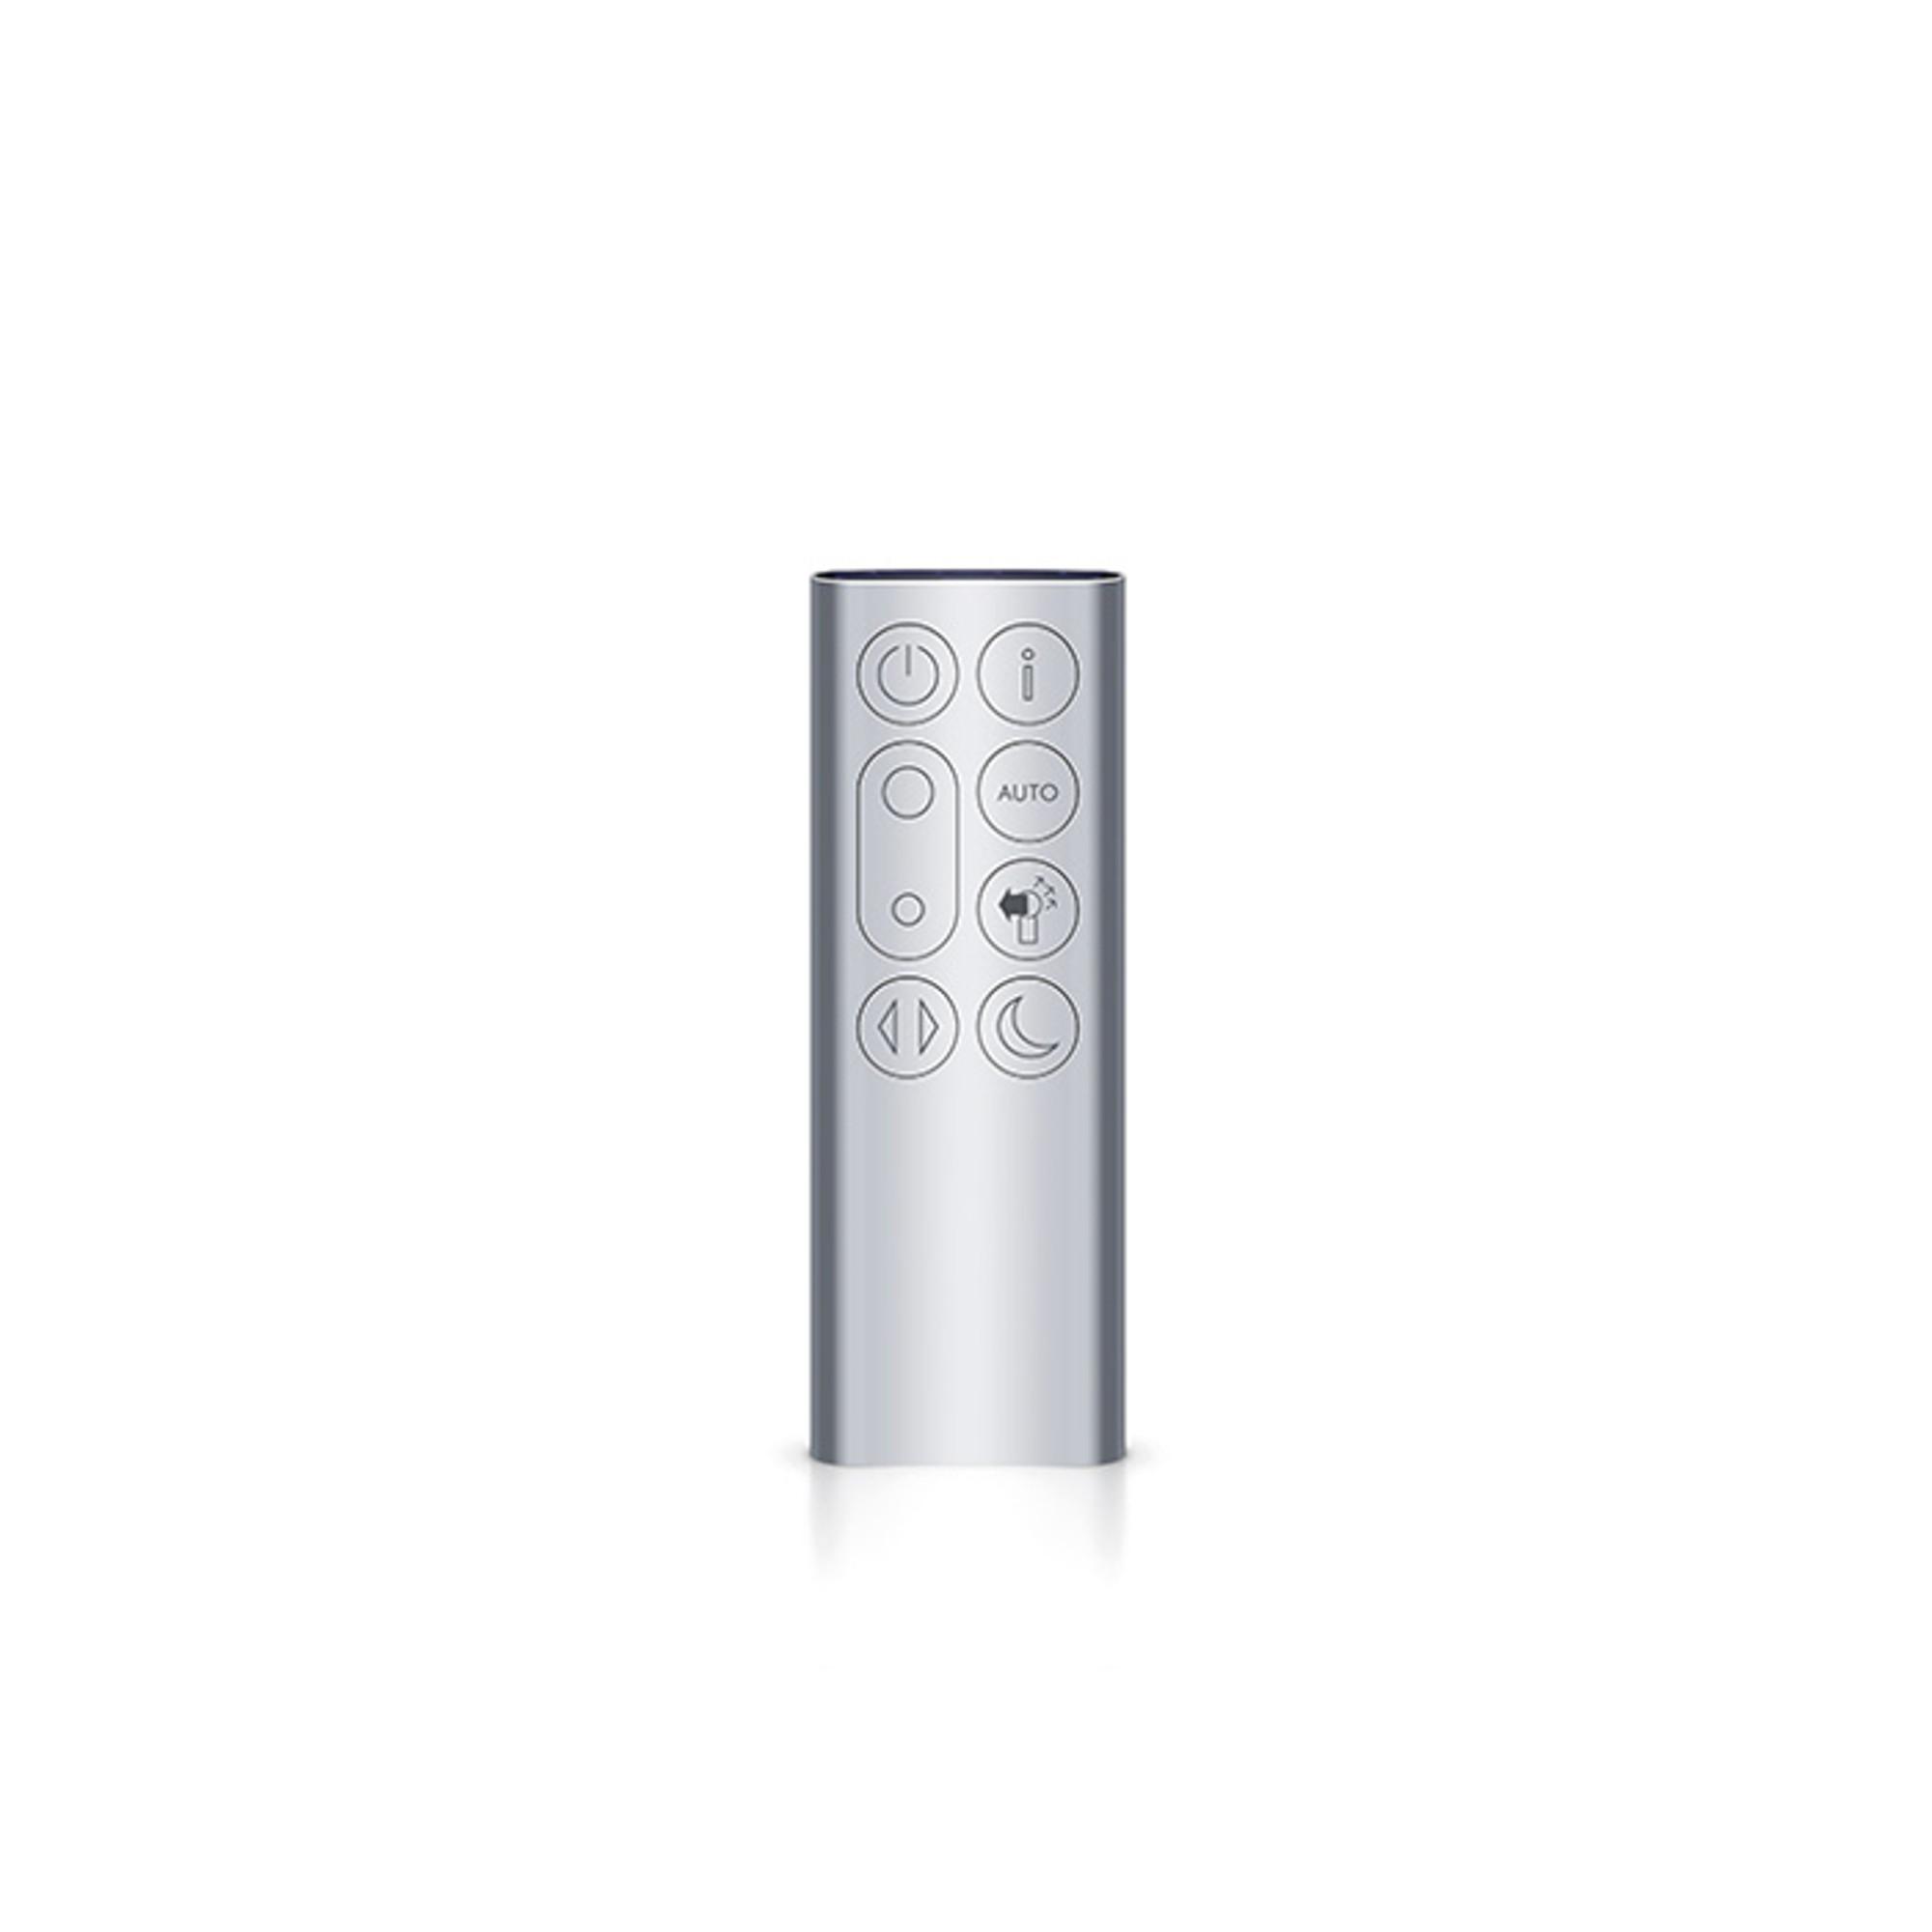 Enjoyable Dyson Pure Cool Desk Air Purifier And Fan Download Free Architecture Designs Embacsunscenecom